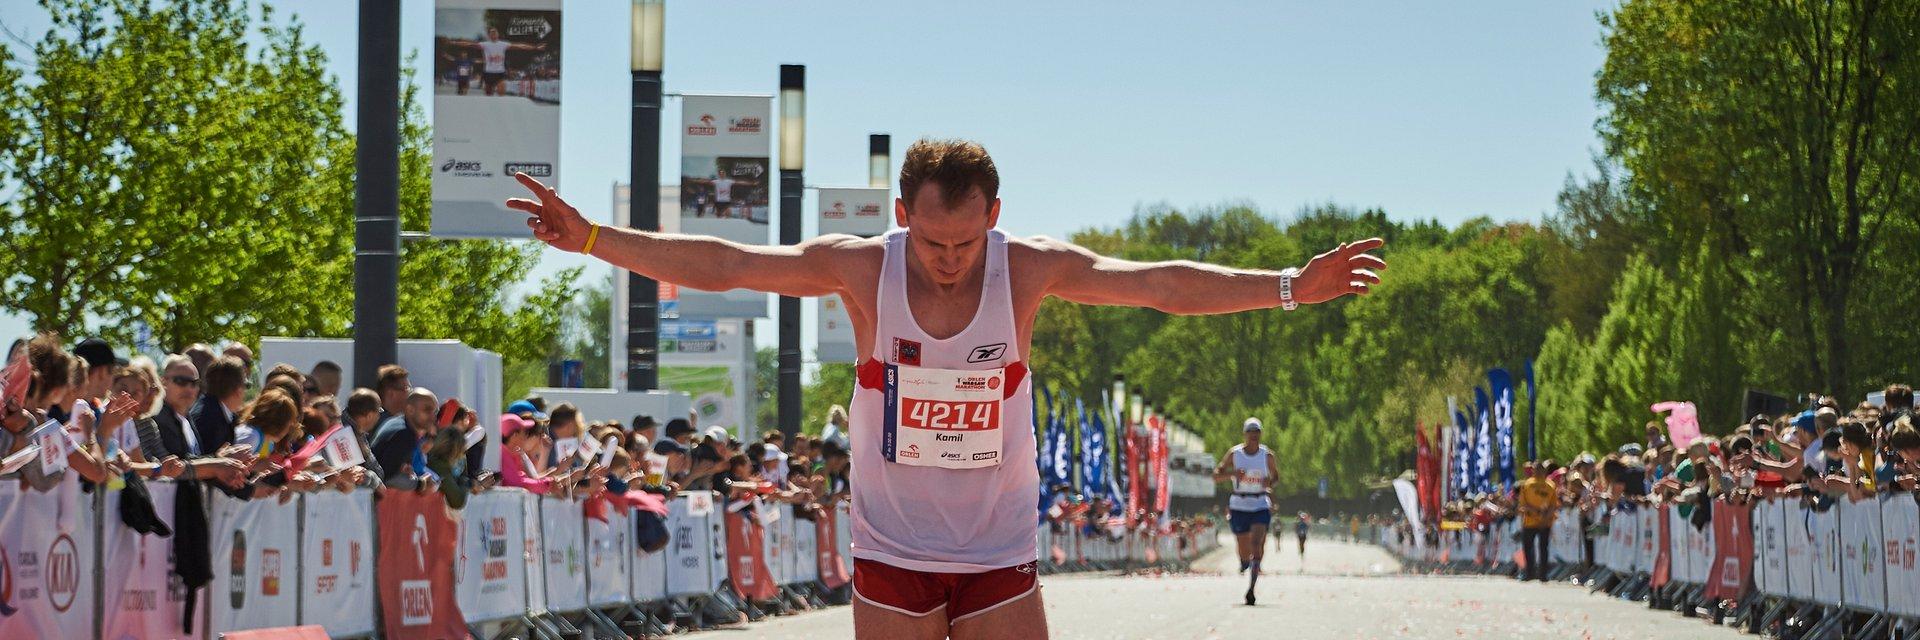 Znamy trasę ORLEN Warsaw Marathon!